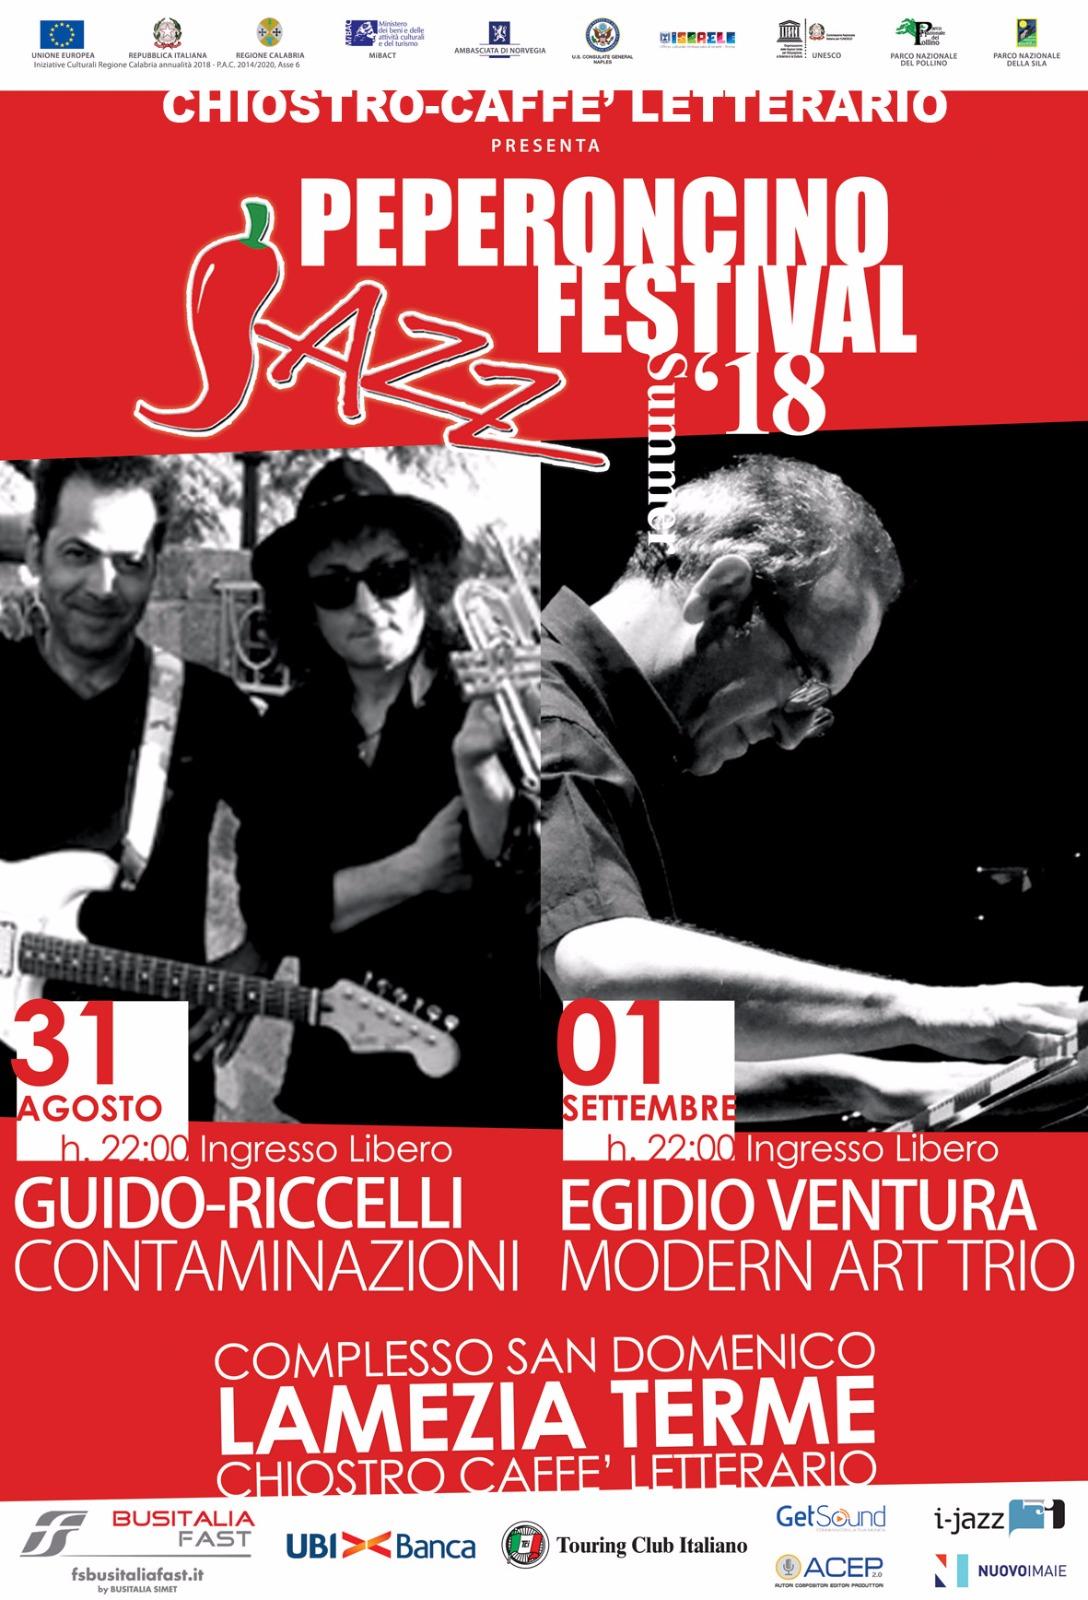 peperoncino jazz festival-LameziaTermeit